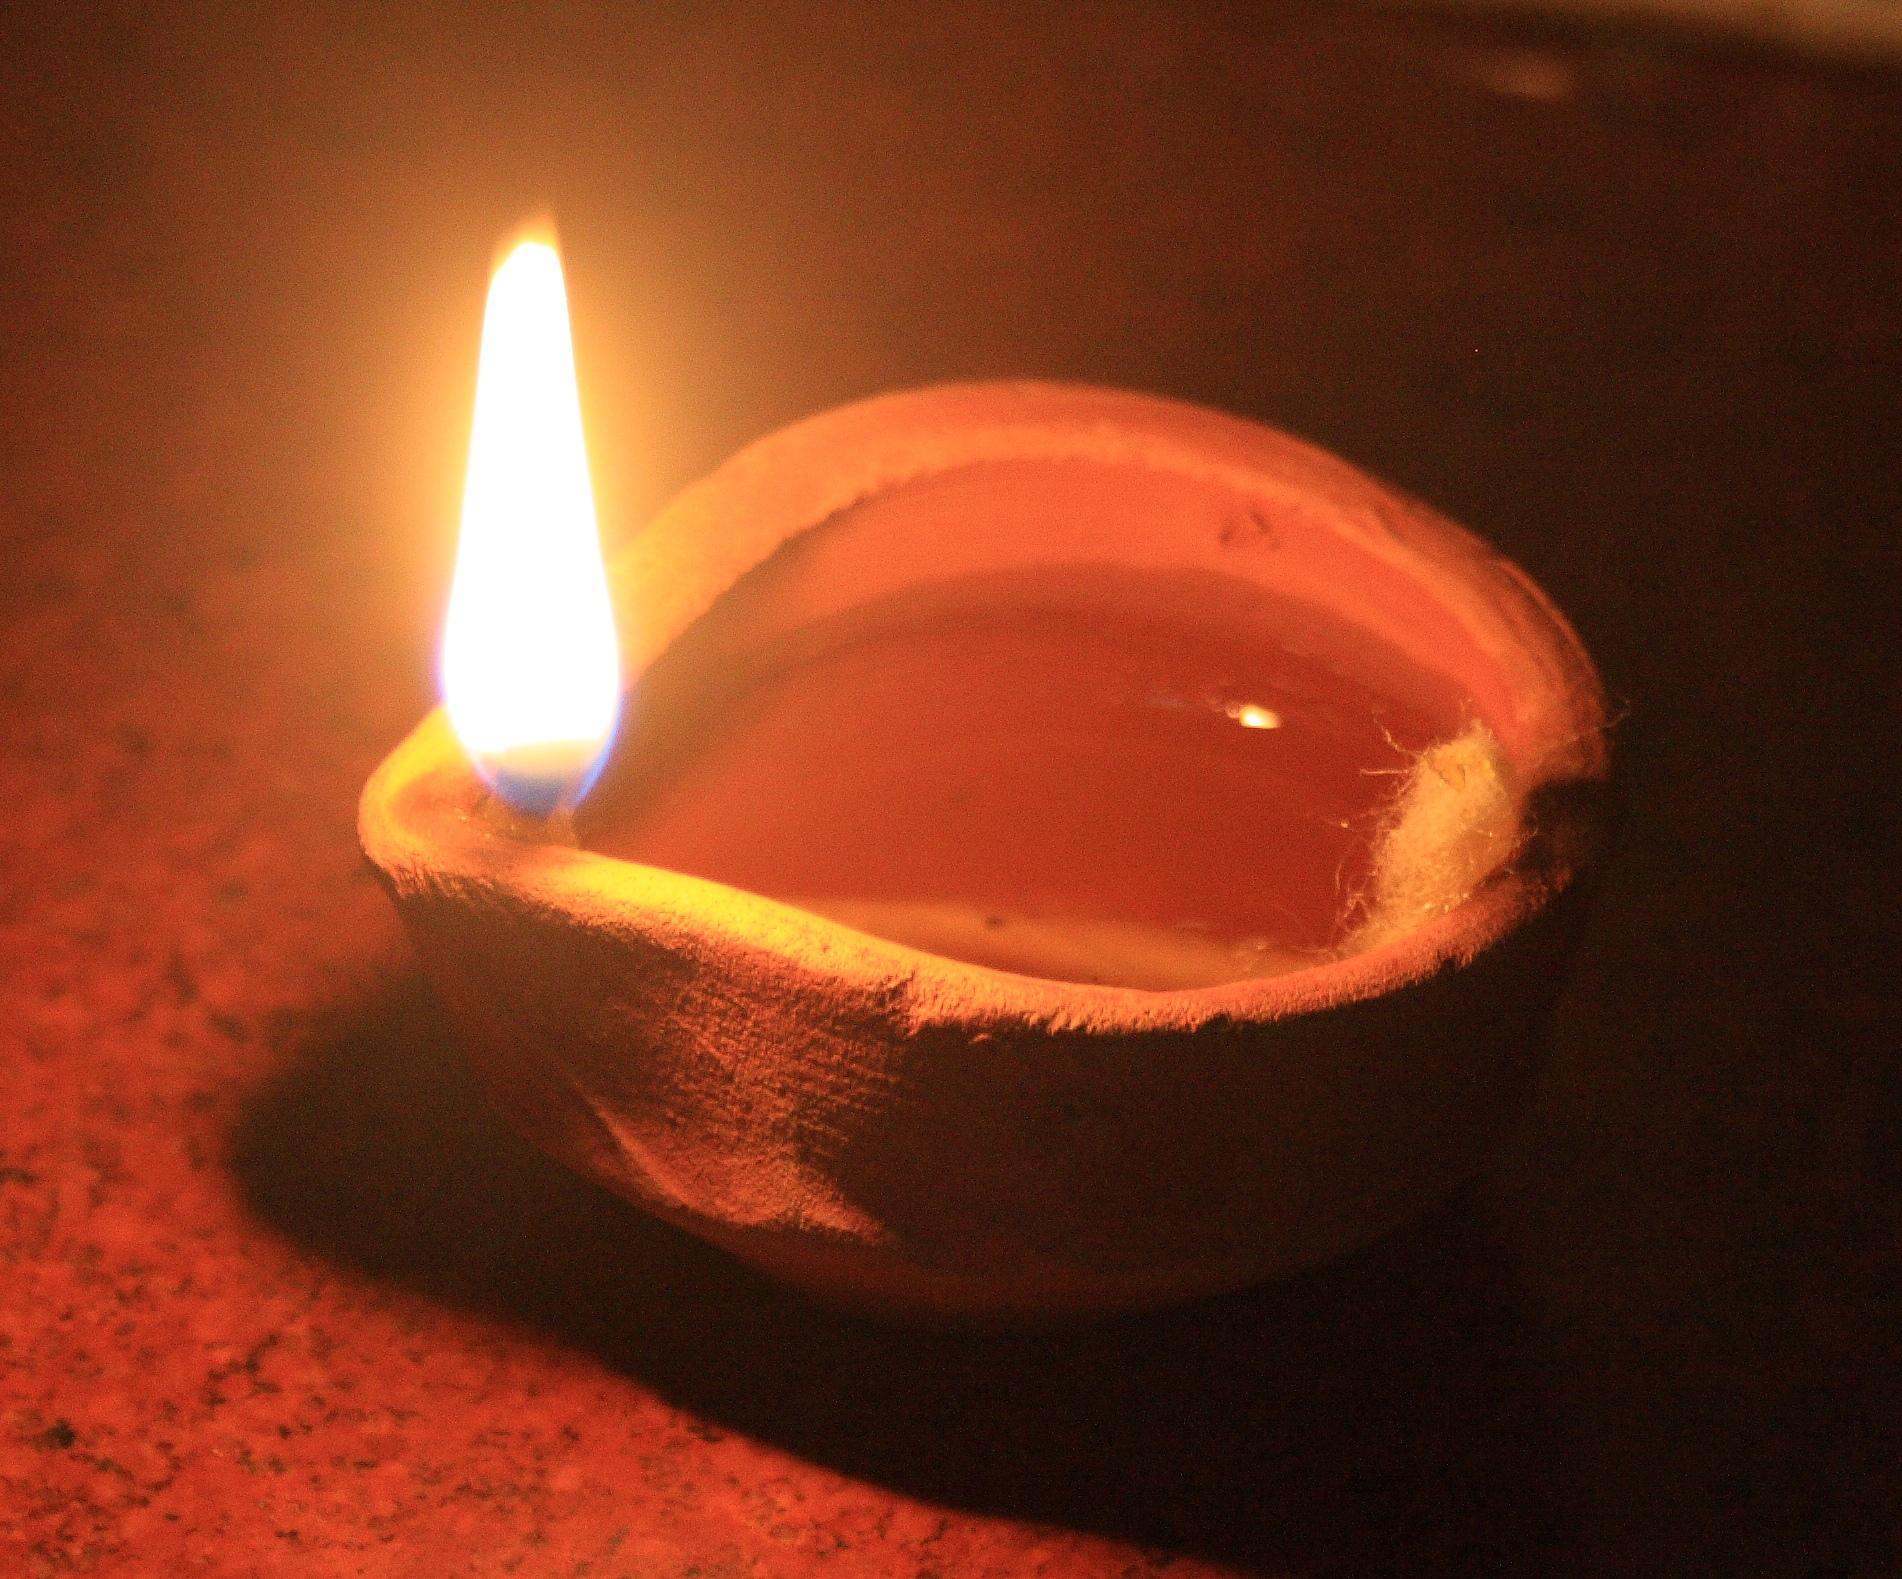 Oil Lamp, Sermon, Matthew 25:1-13, Proper 27A, Parable of the Bridesmaids